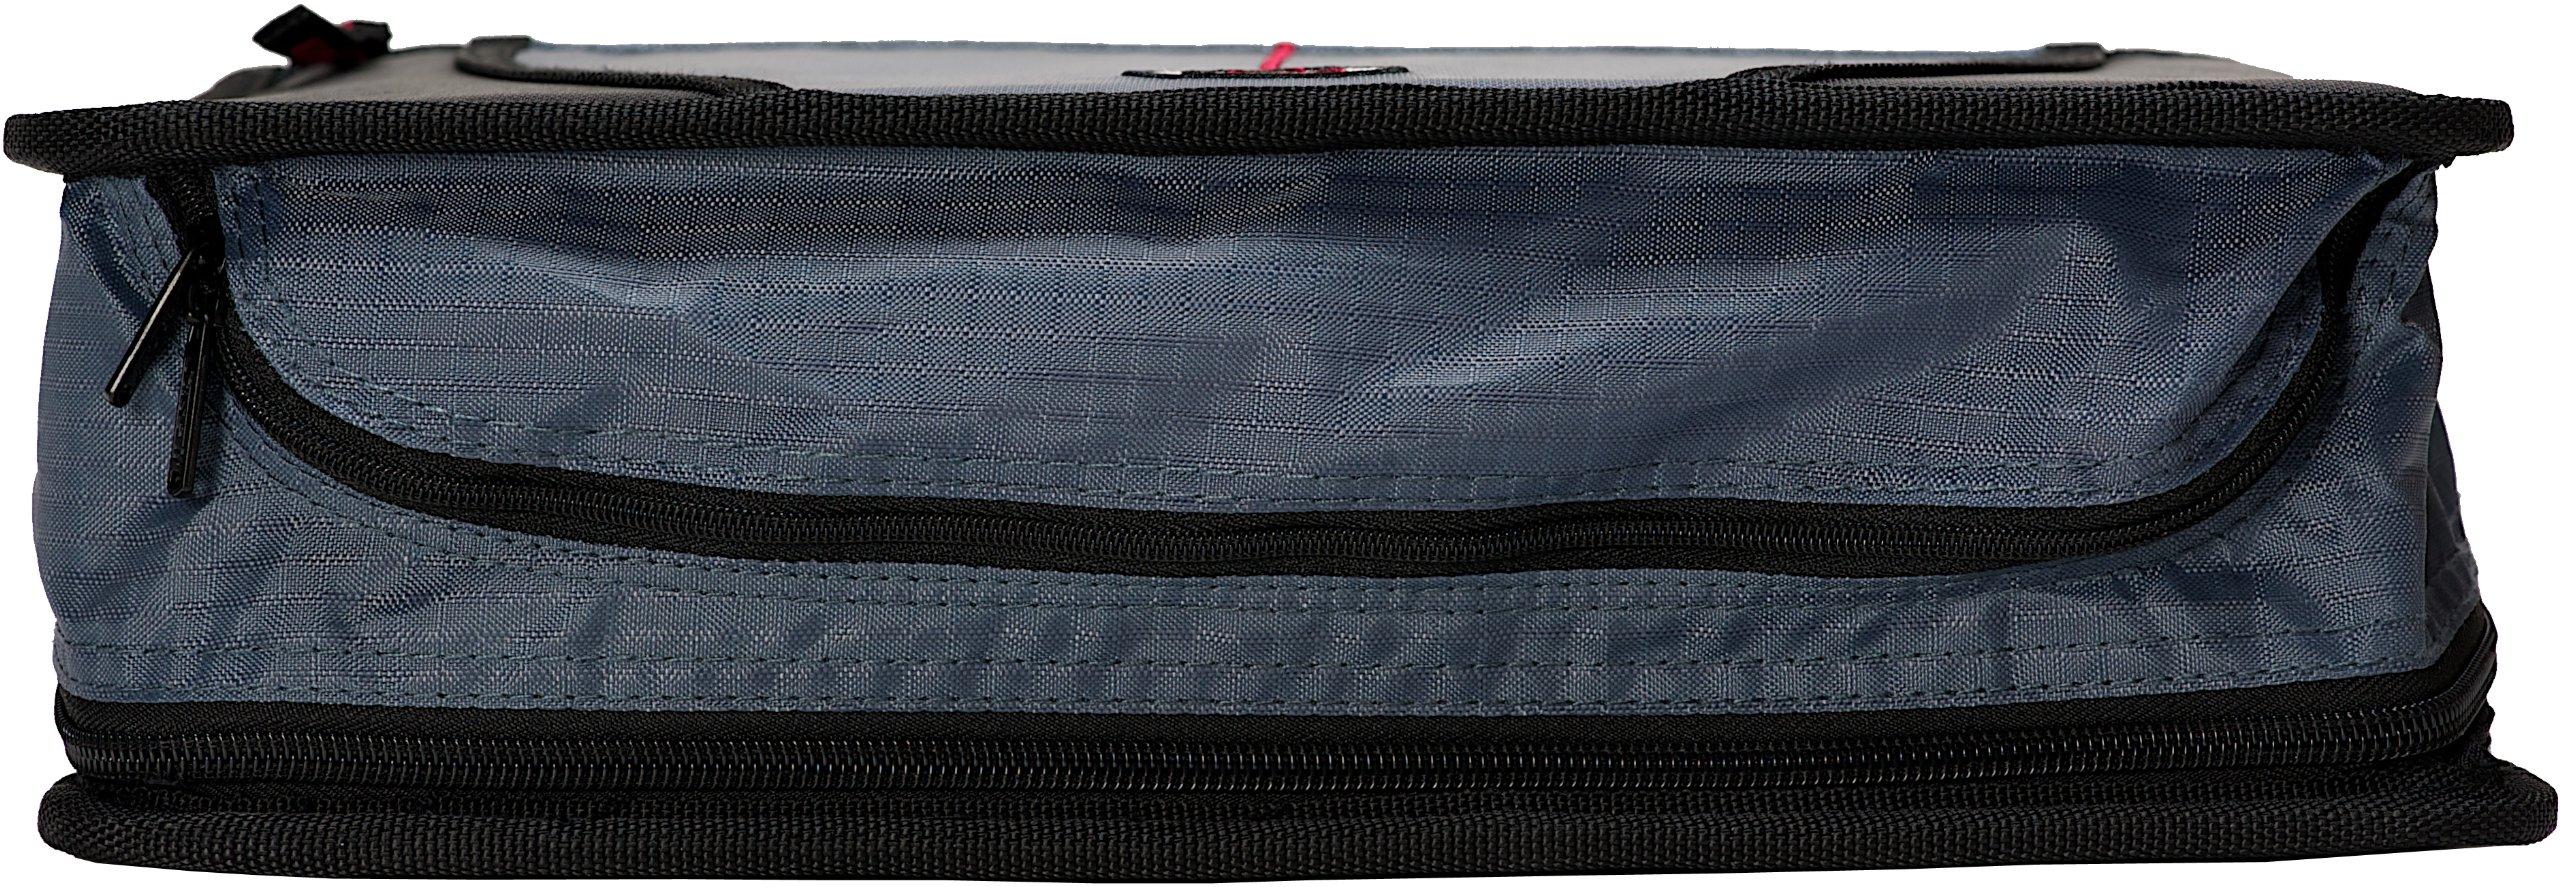 D-146-C-BLK Case of 6 Case-it Mighty Zip Tab 3-Inch Zipper Binder Black